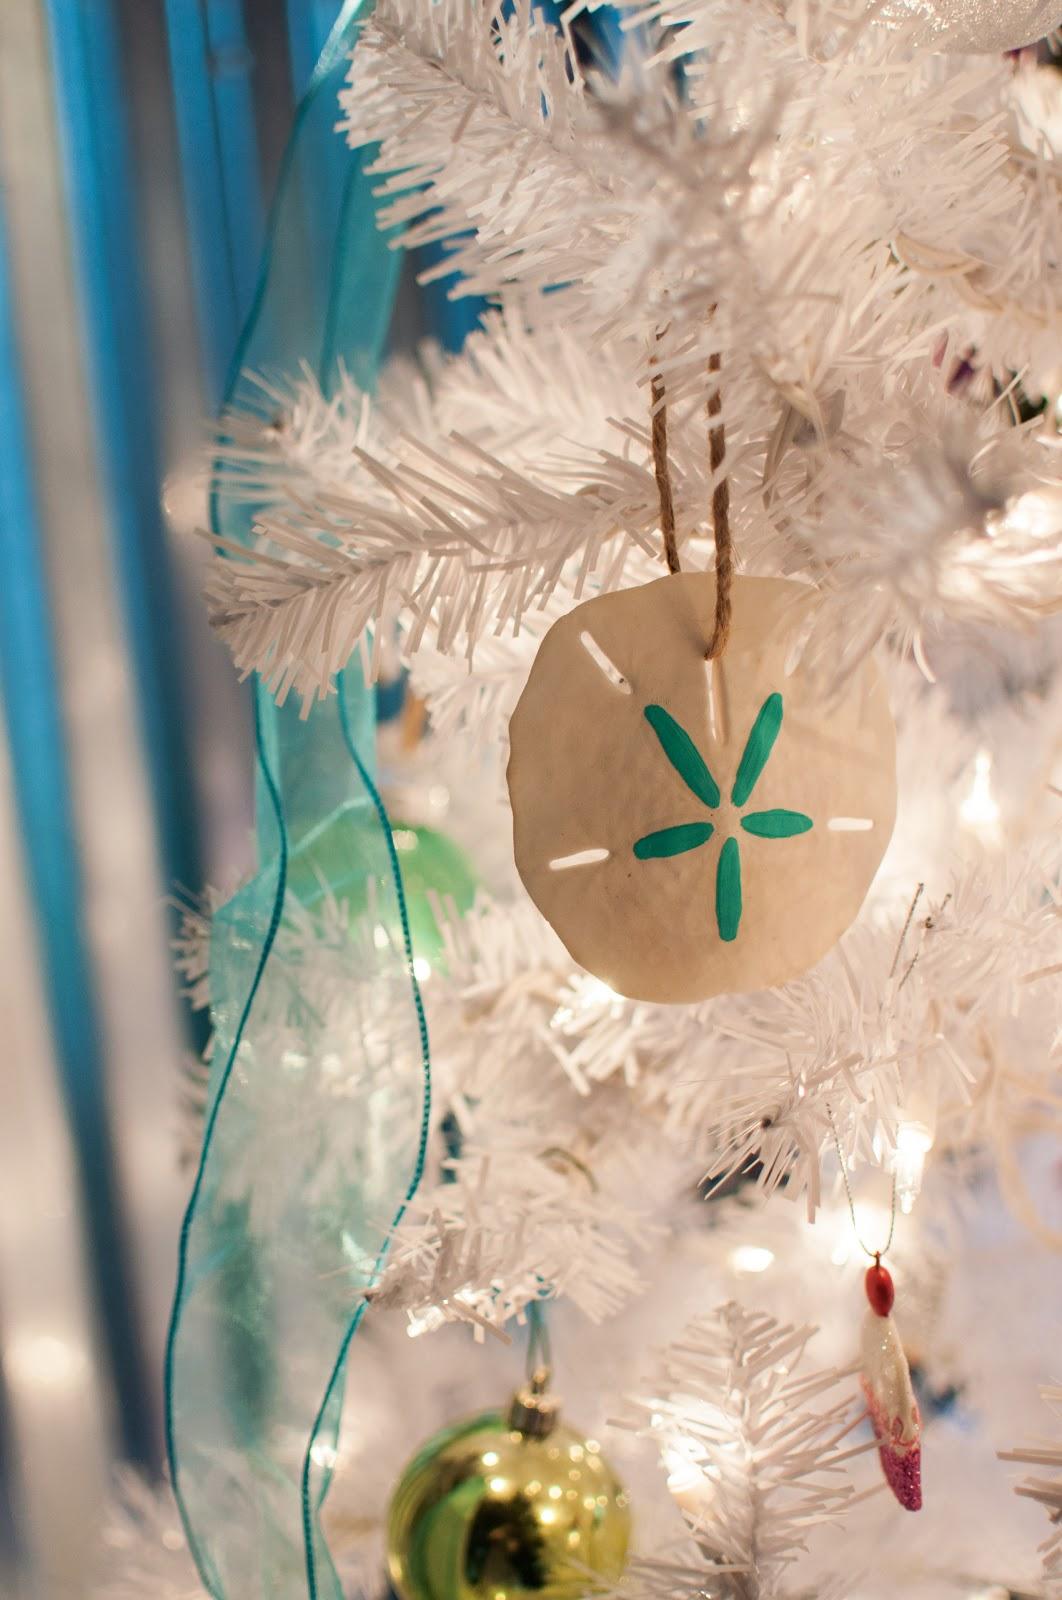 Art actually diy seashell ornaments for Seashell ornaments diy